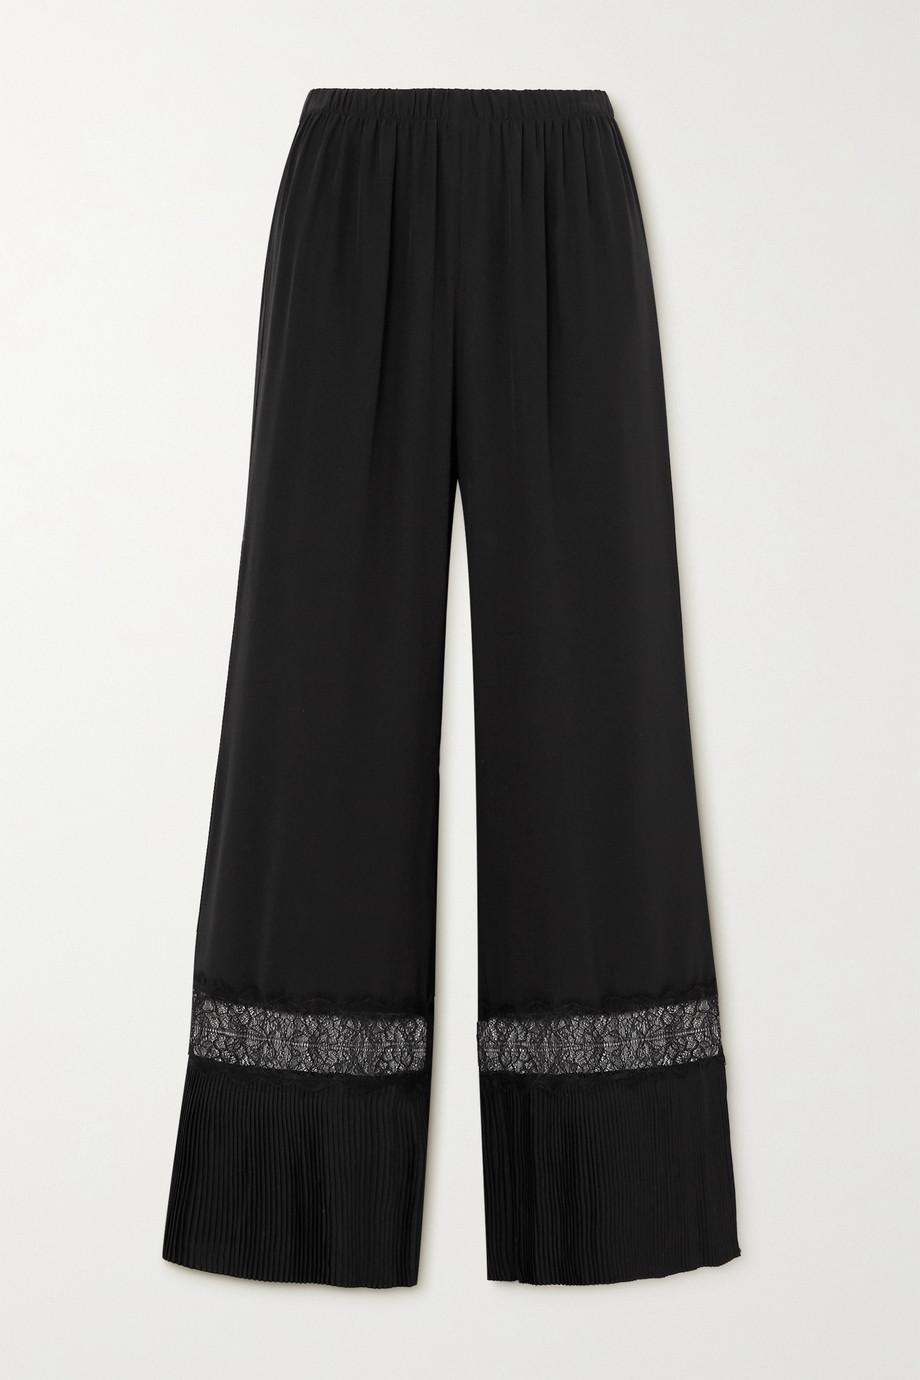 Sleeping with Jacques The Osiris lace-trimmed plissé-silk crepe de chine pajama pants